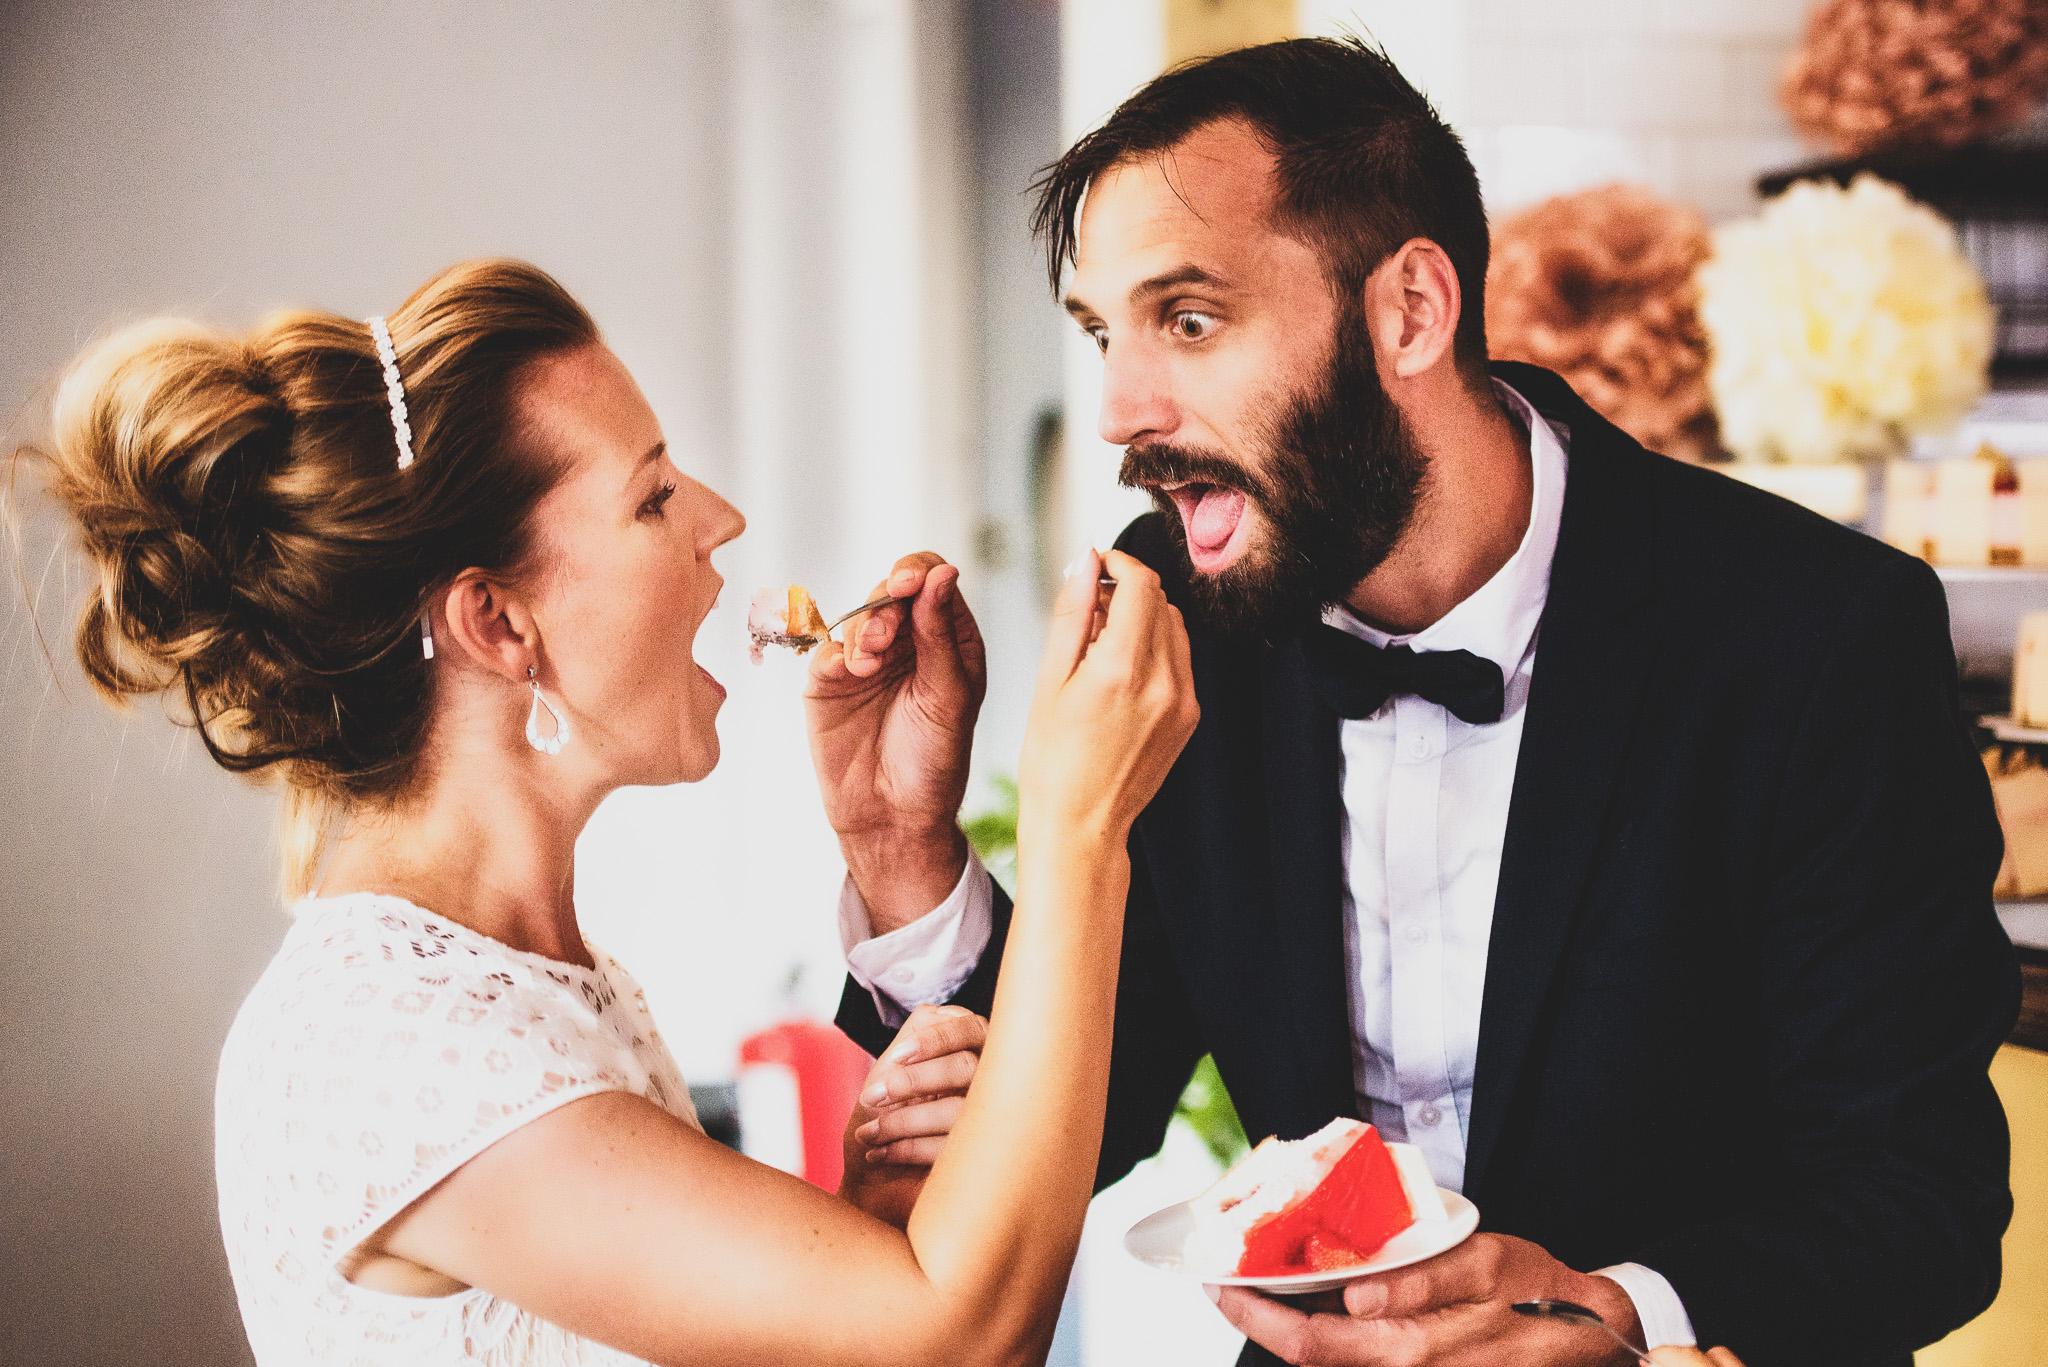 Eventfoto: Bröllop